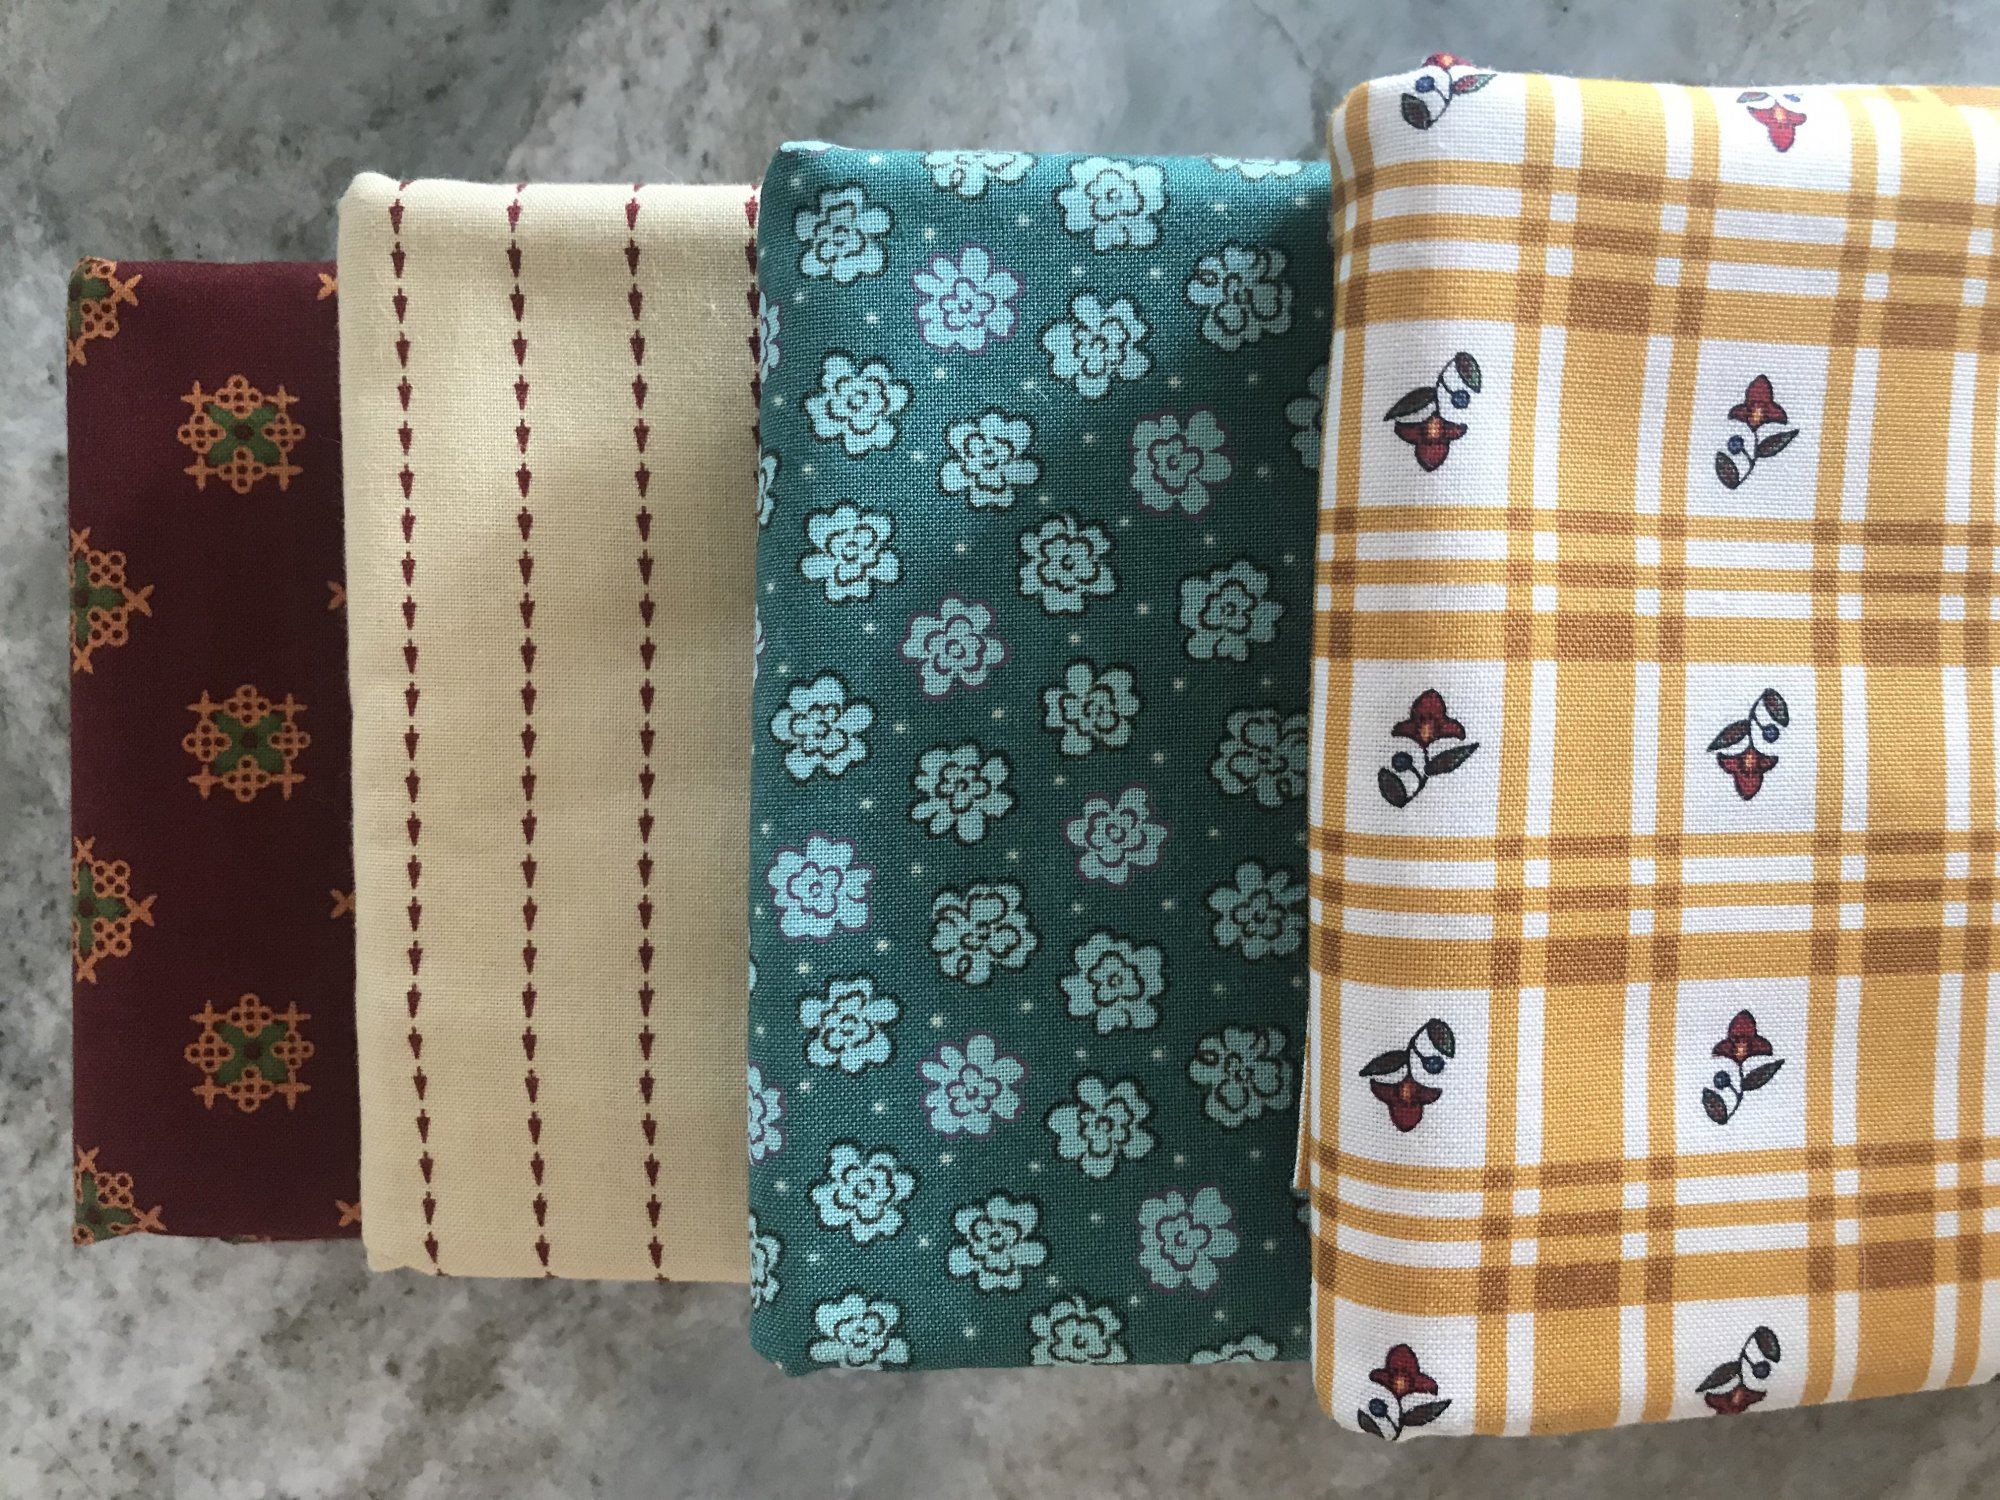 6-B 4 Moda Fabrics One Yard Cuts